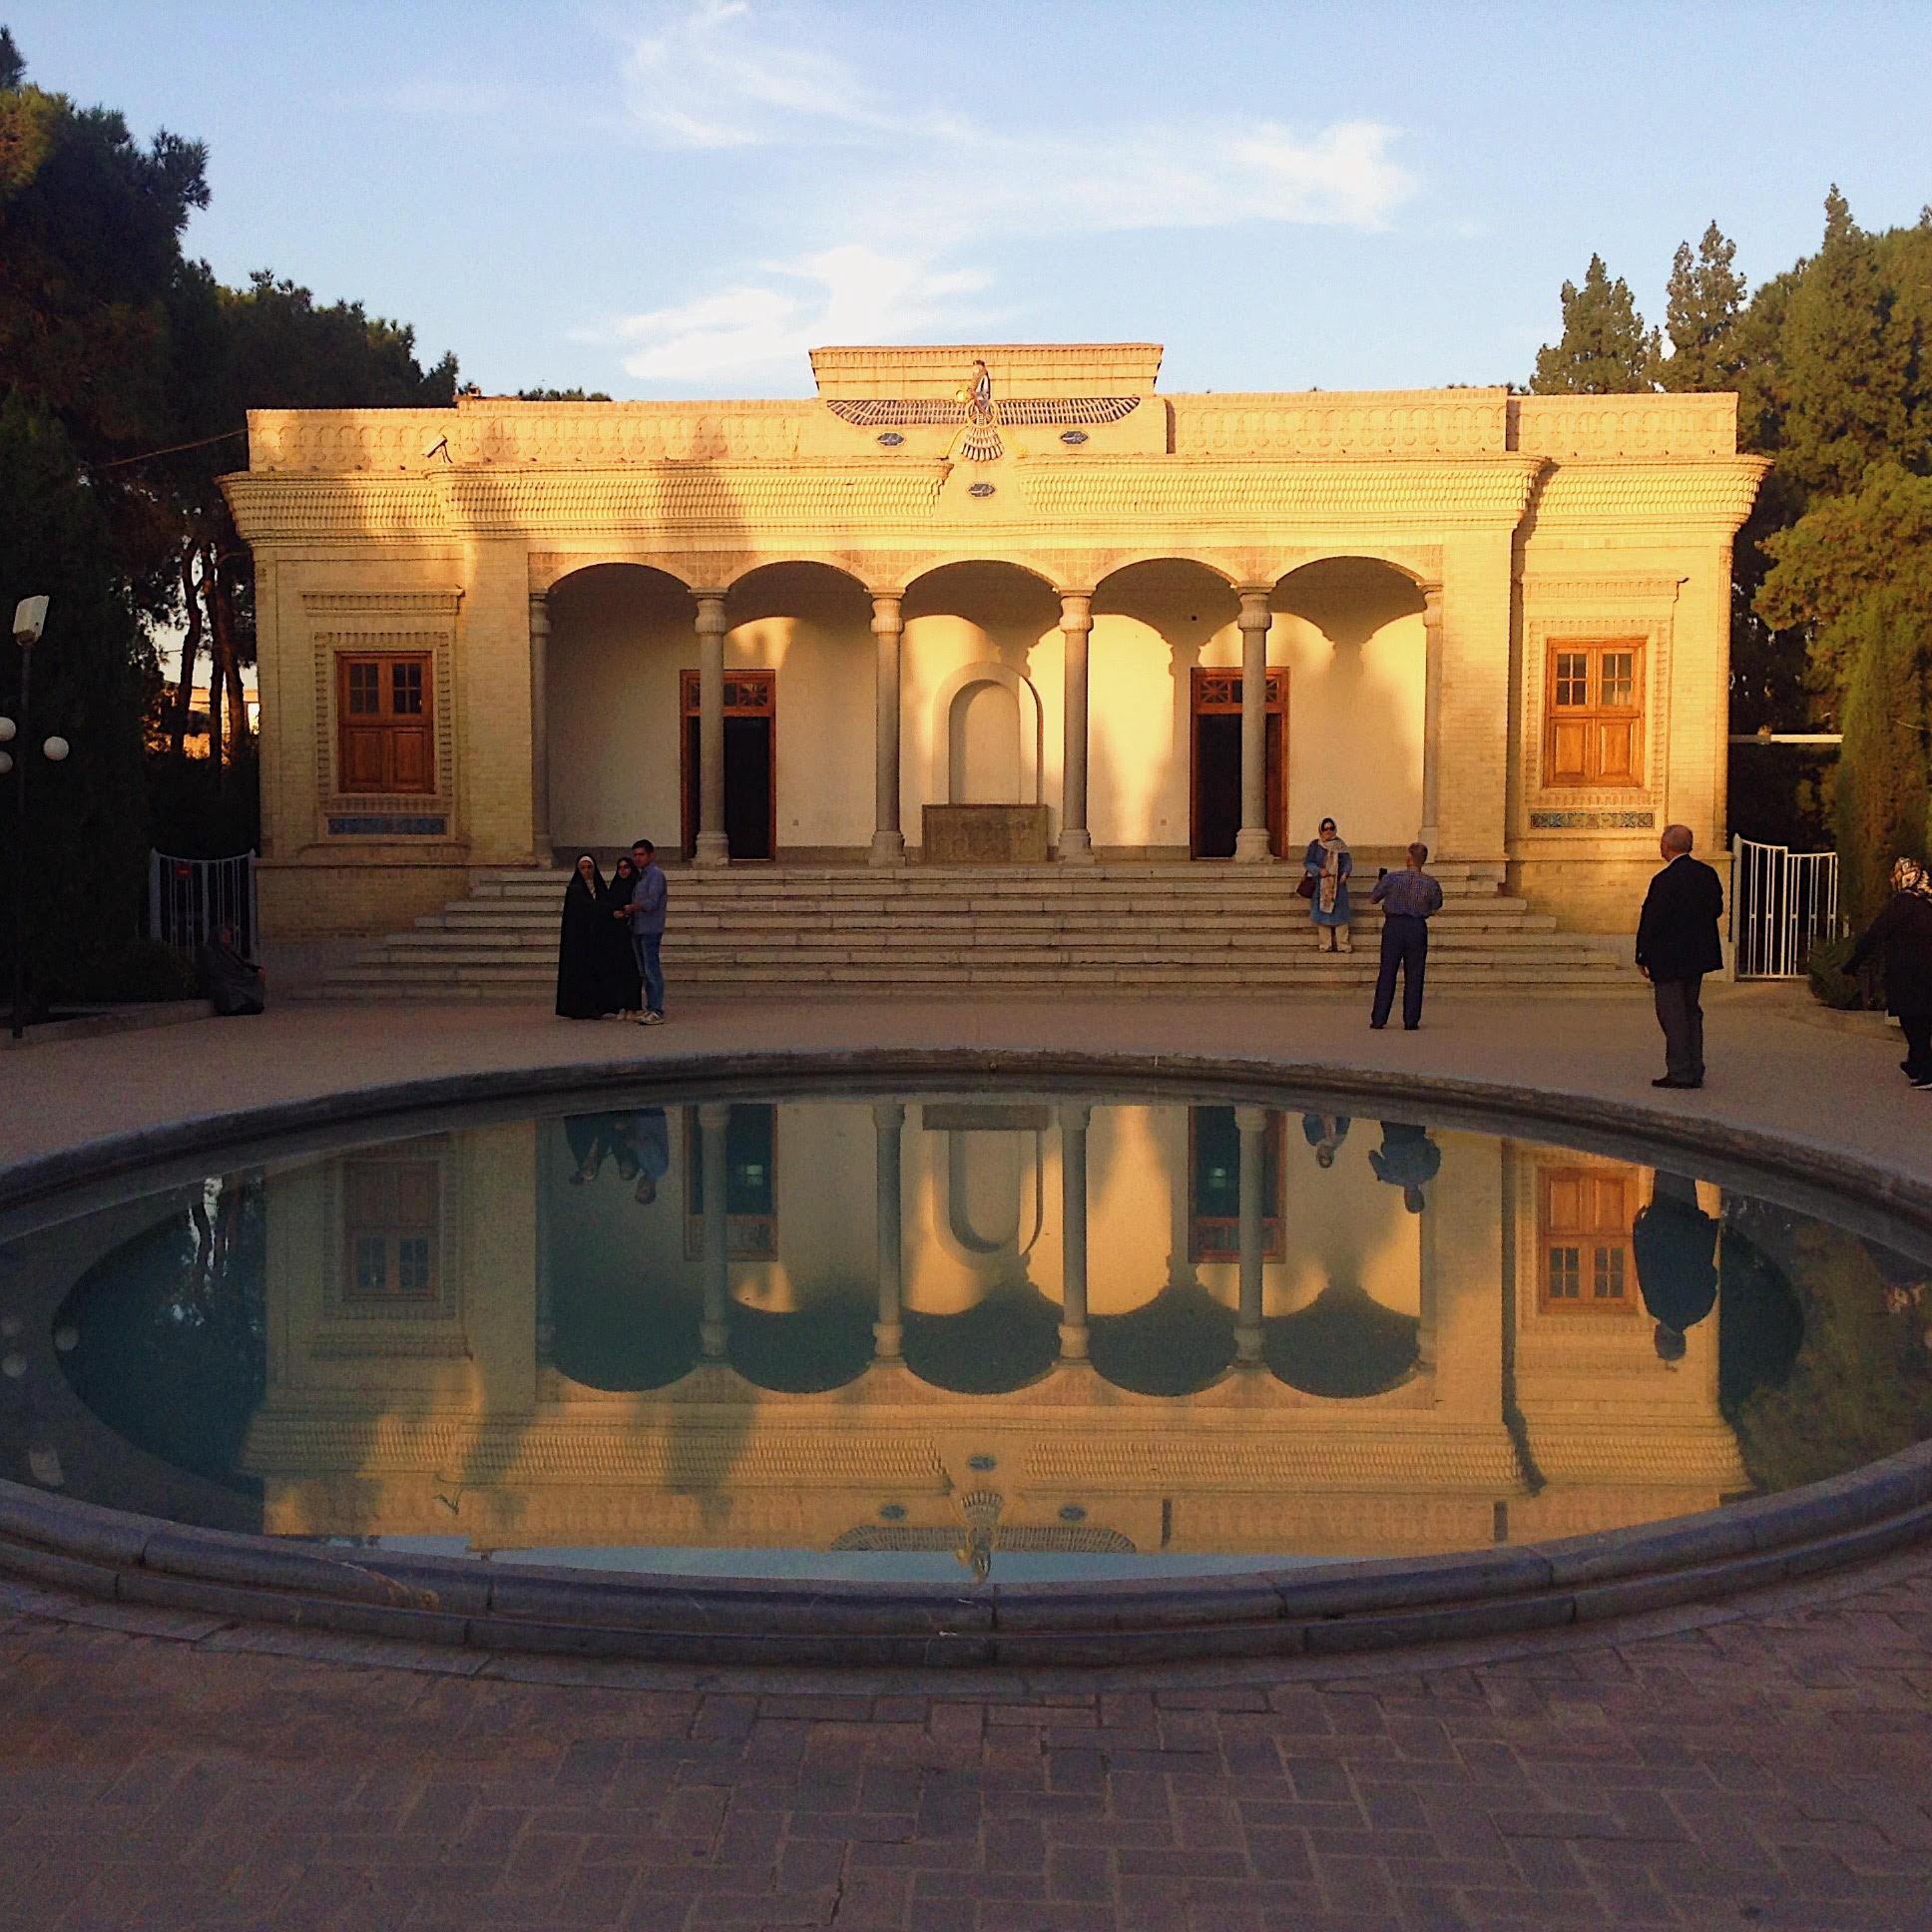 Zoroastrian fire temple in Yazd, Iran